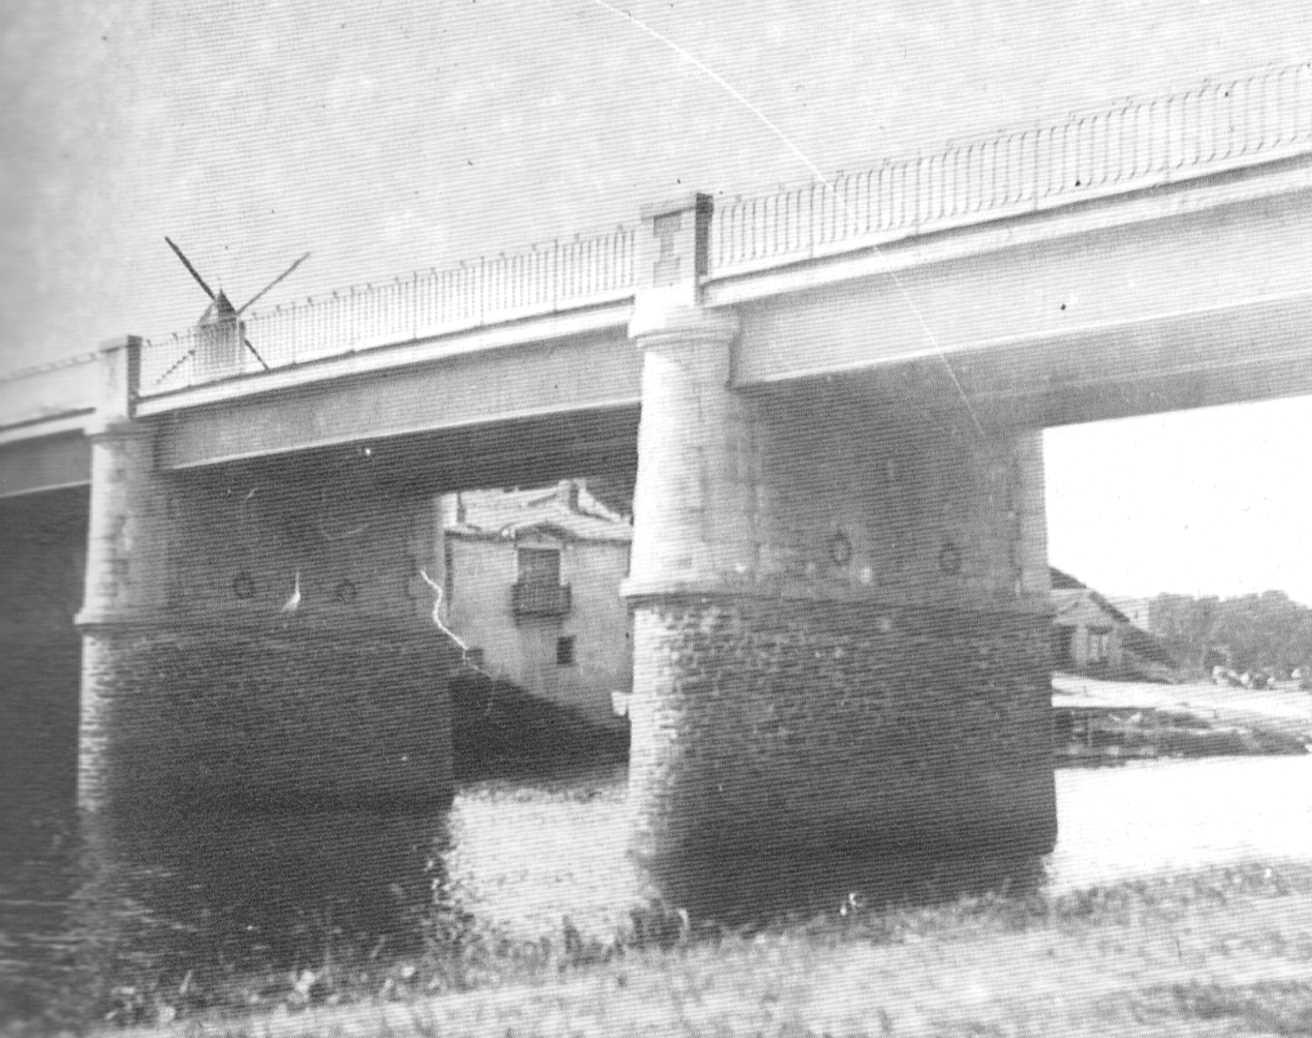 Pont du chene